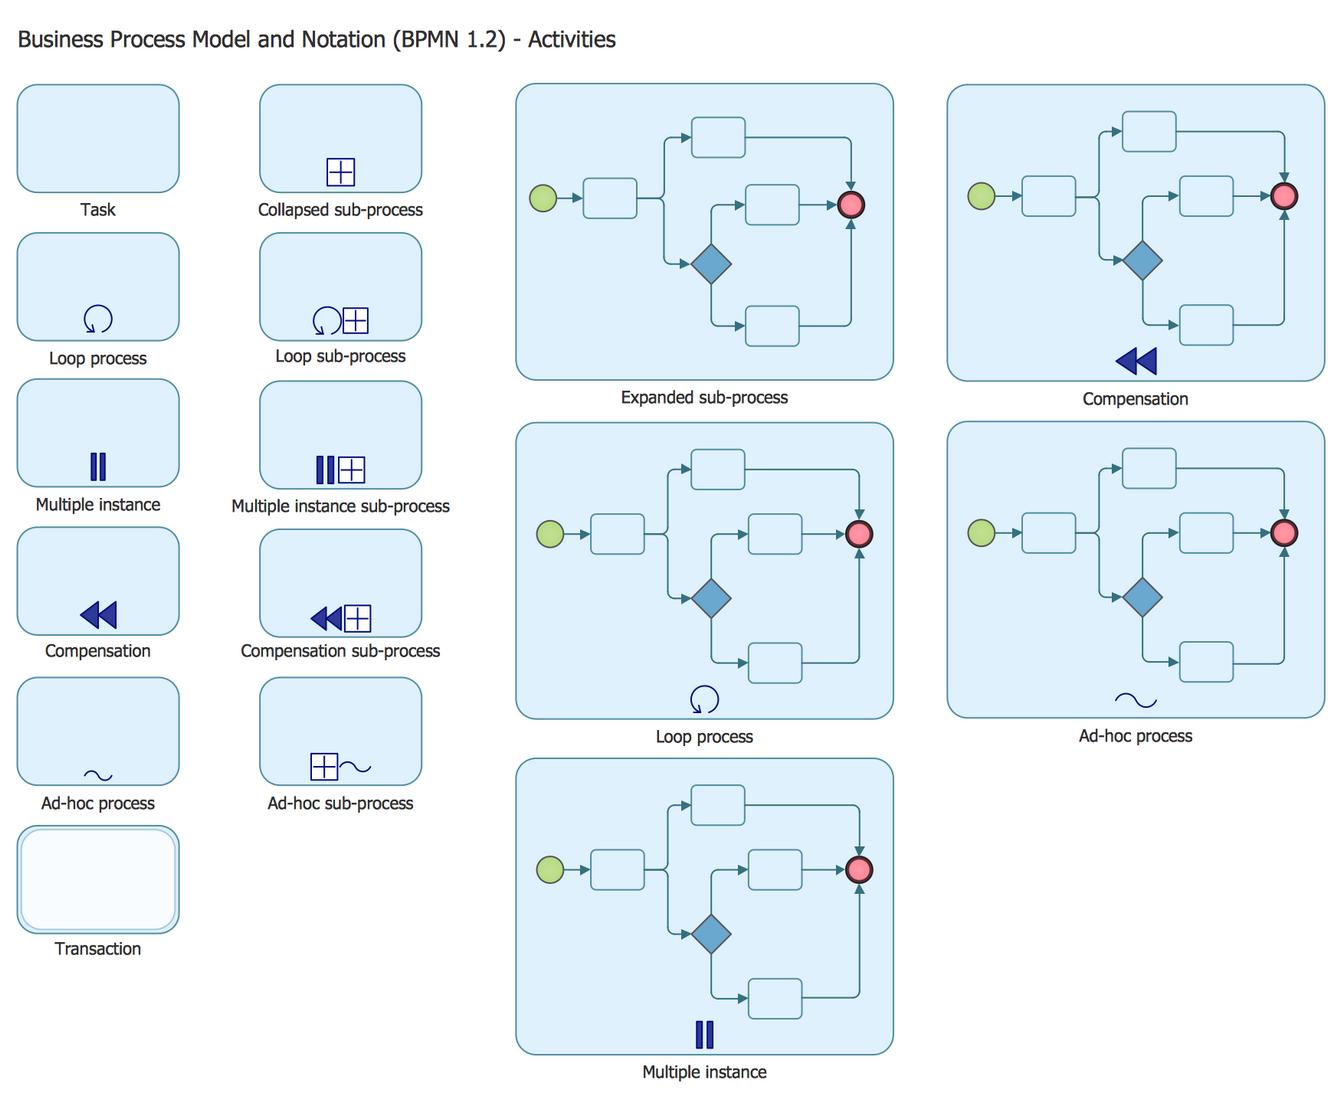 Business process diagram solution conceptdraw design elements bpmn 12 activities ccuart Images